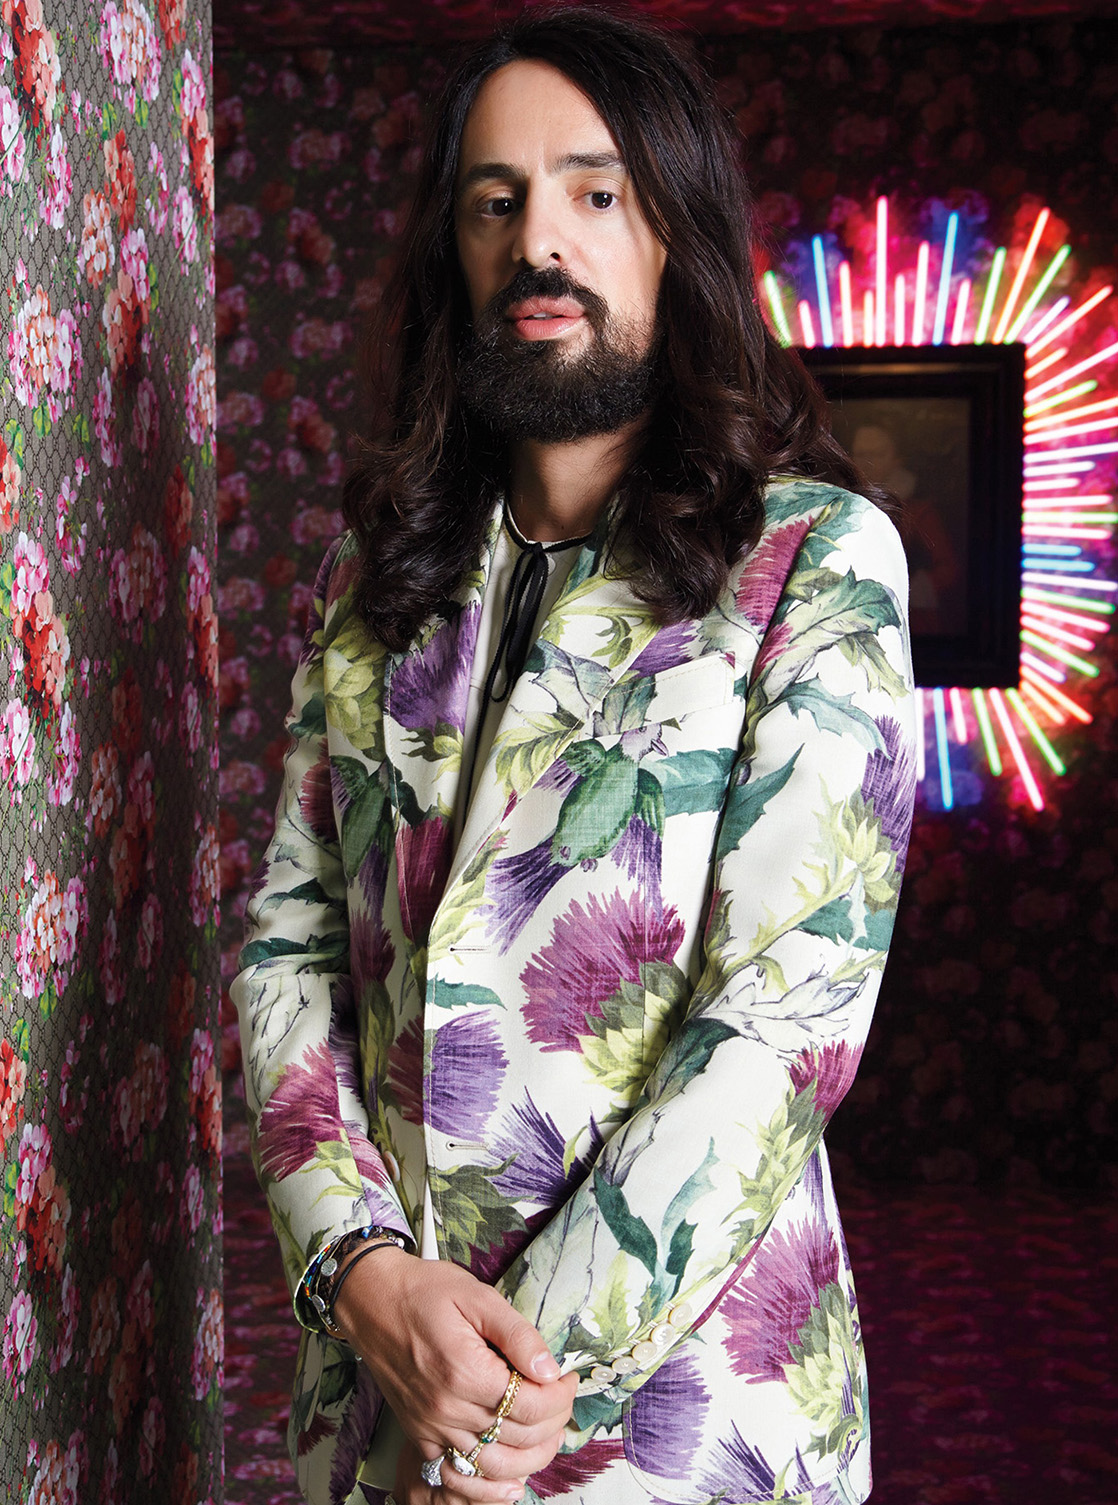 The Fashion Network - Image credit: W Magazine